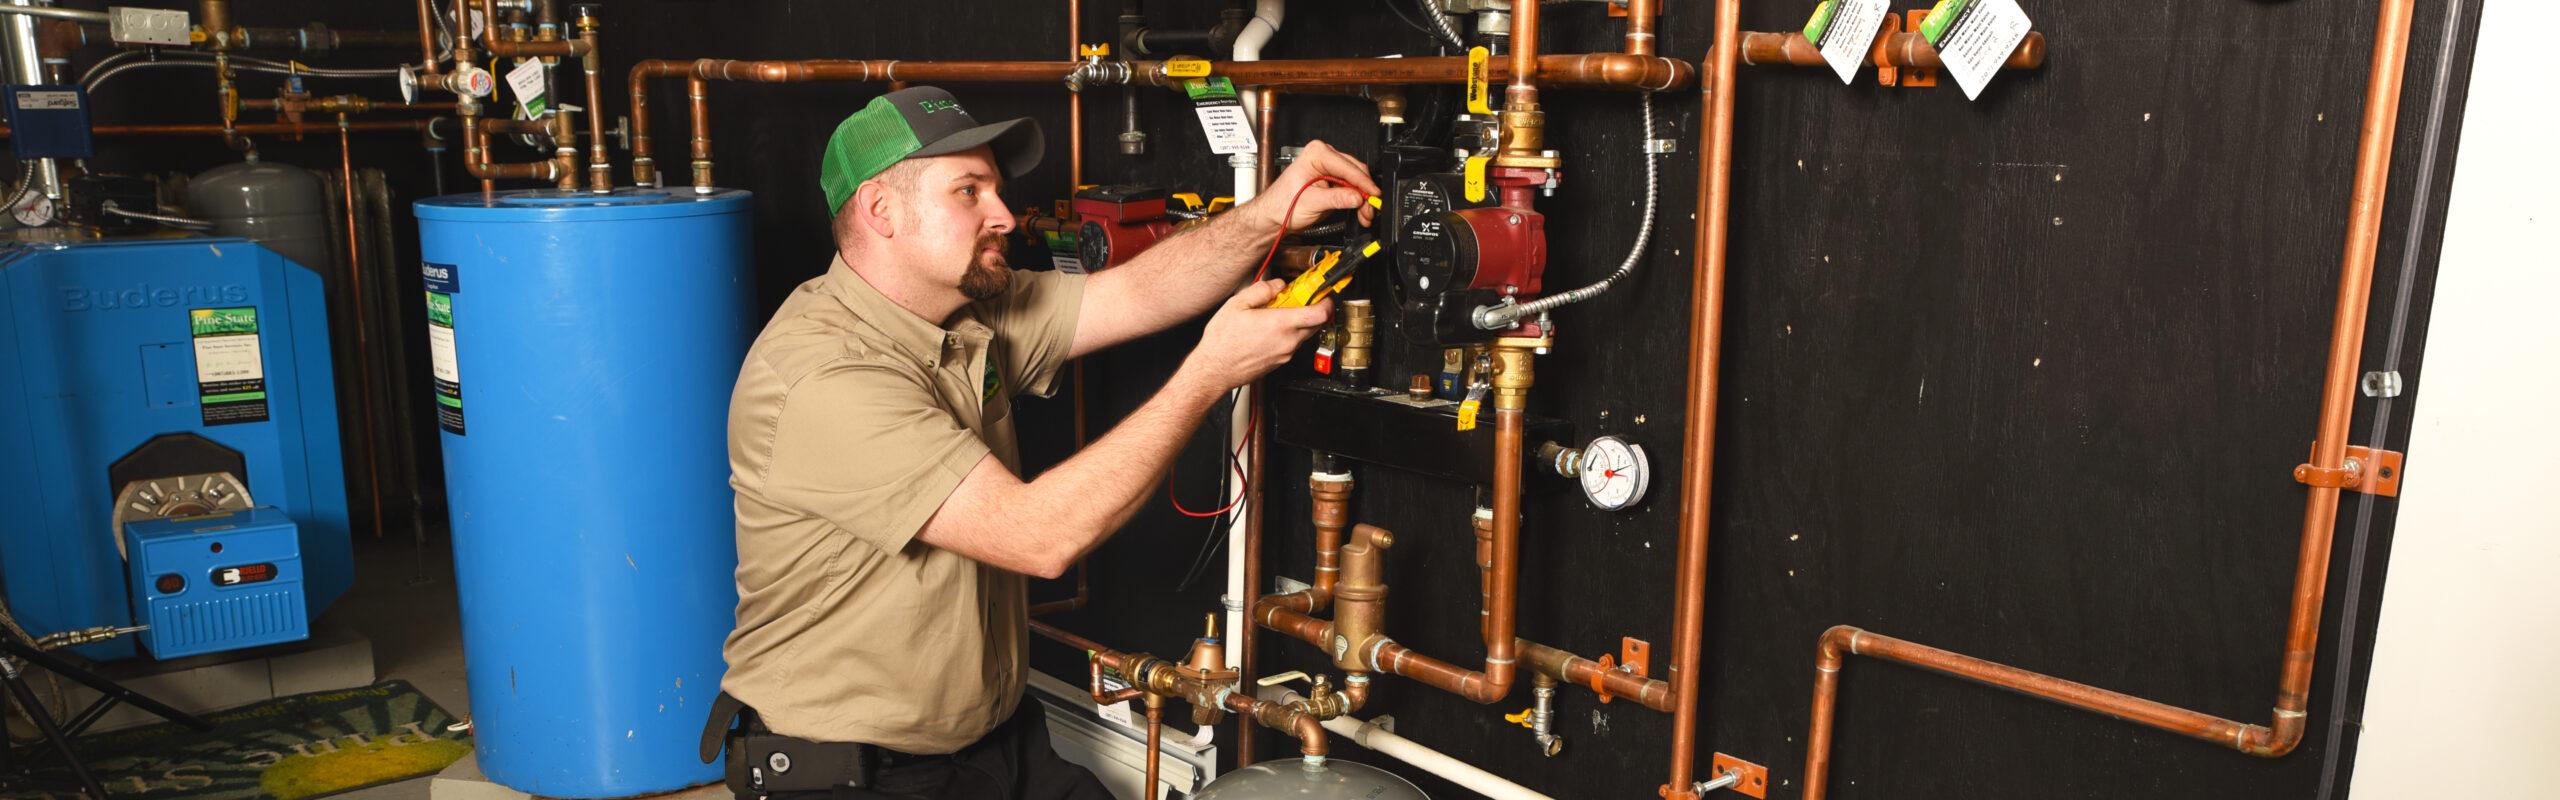 HVAC/R Technician Image